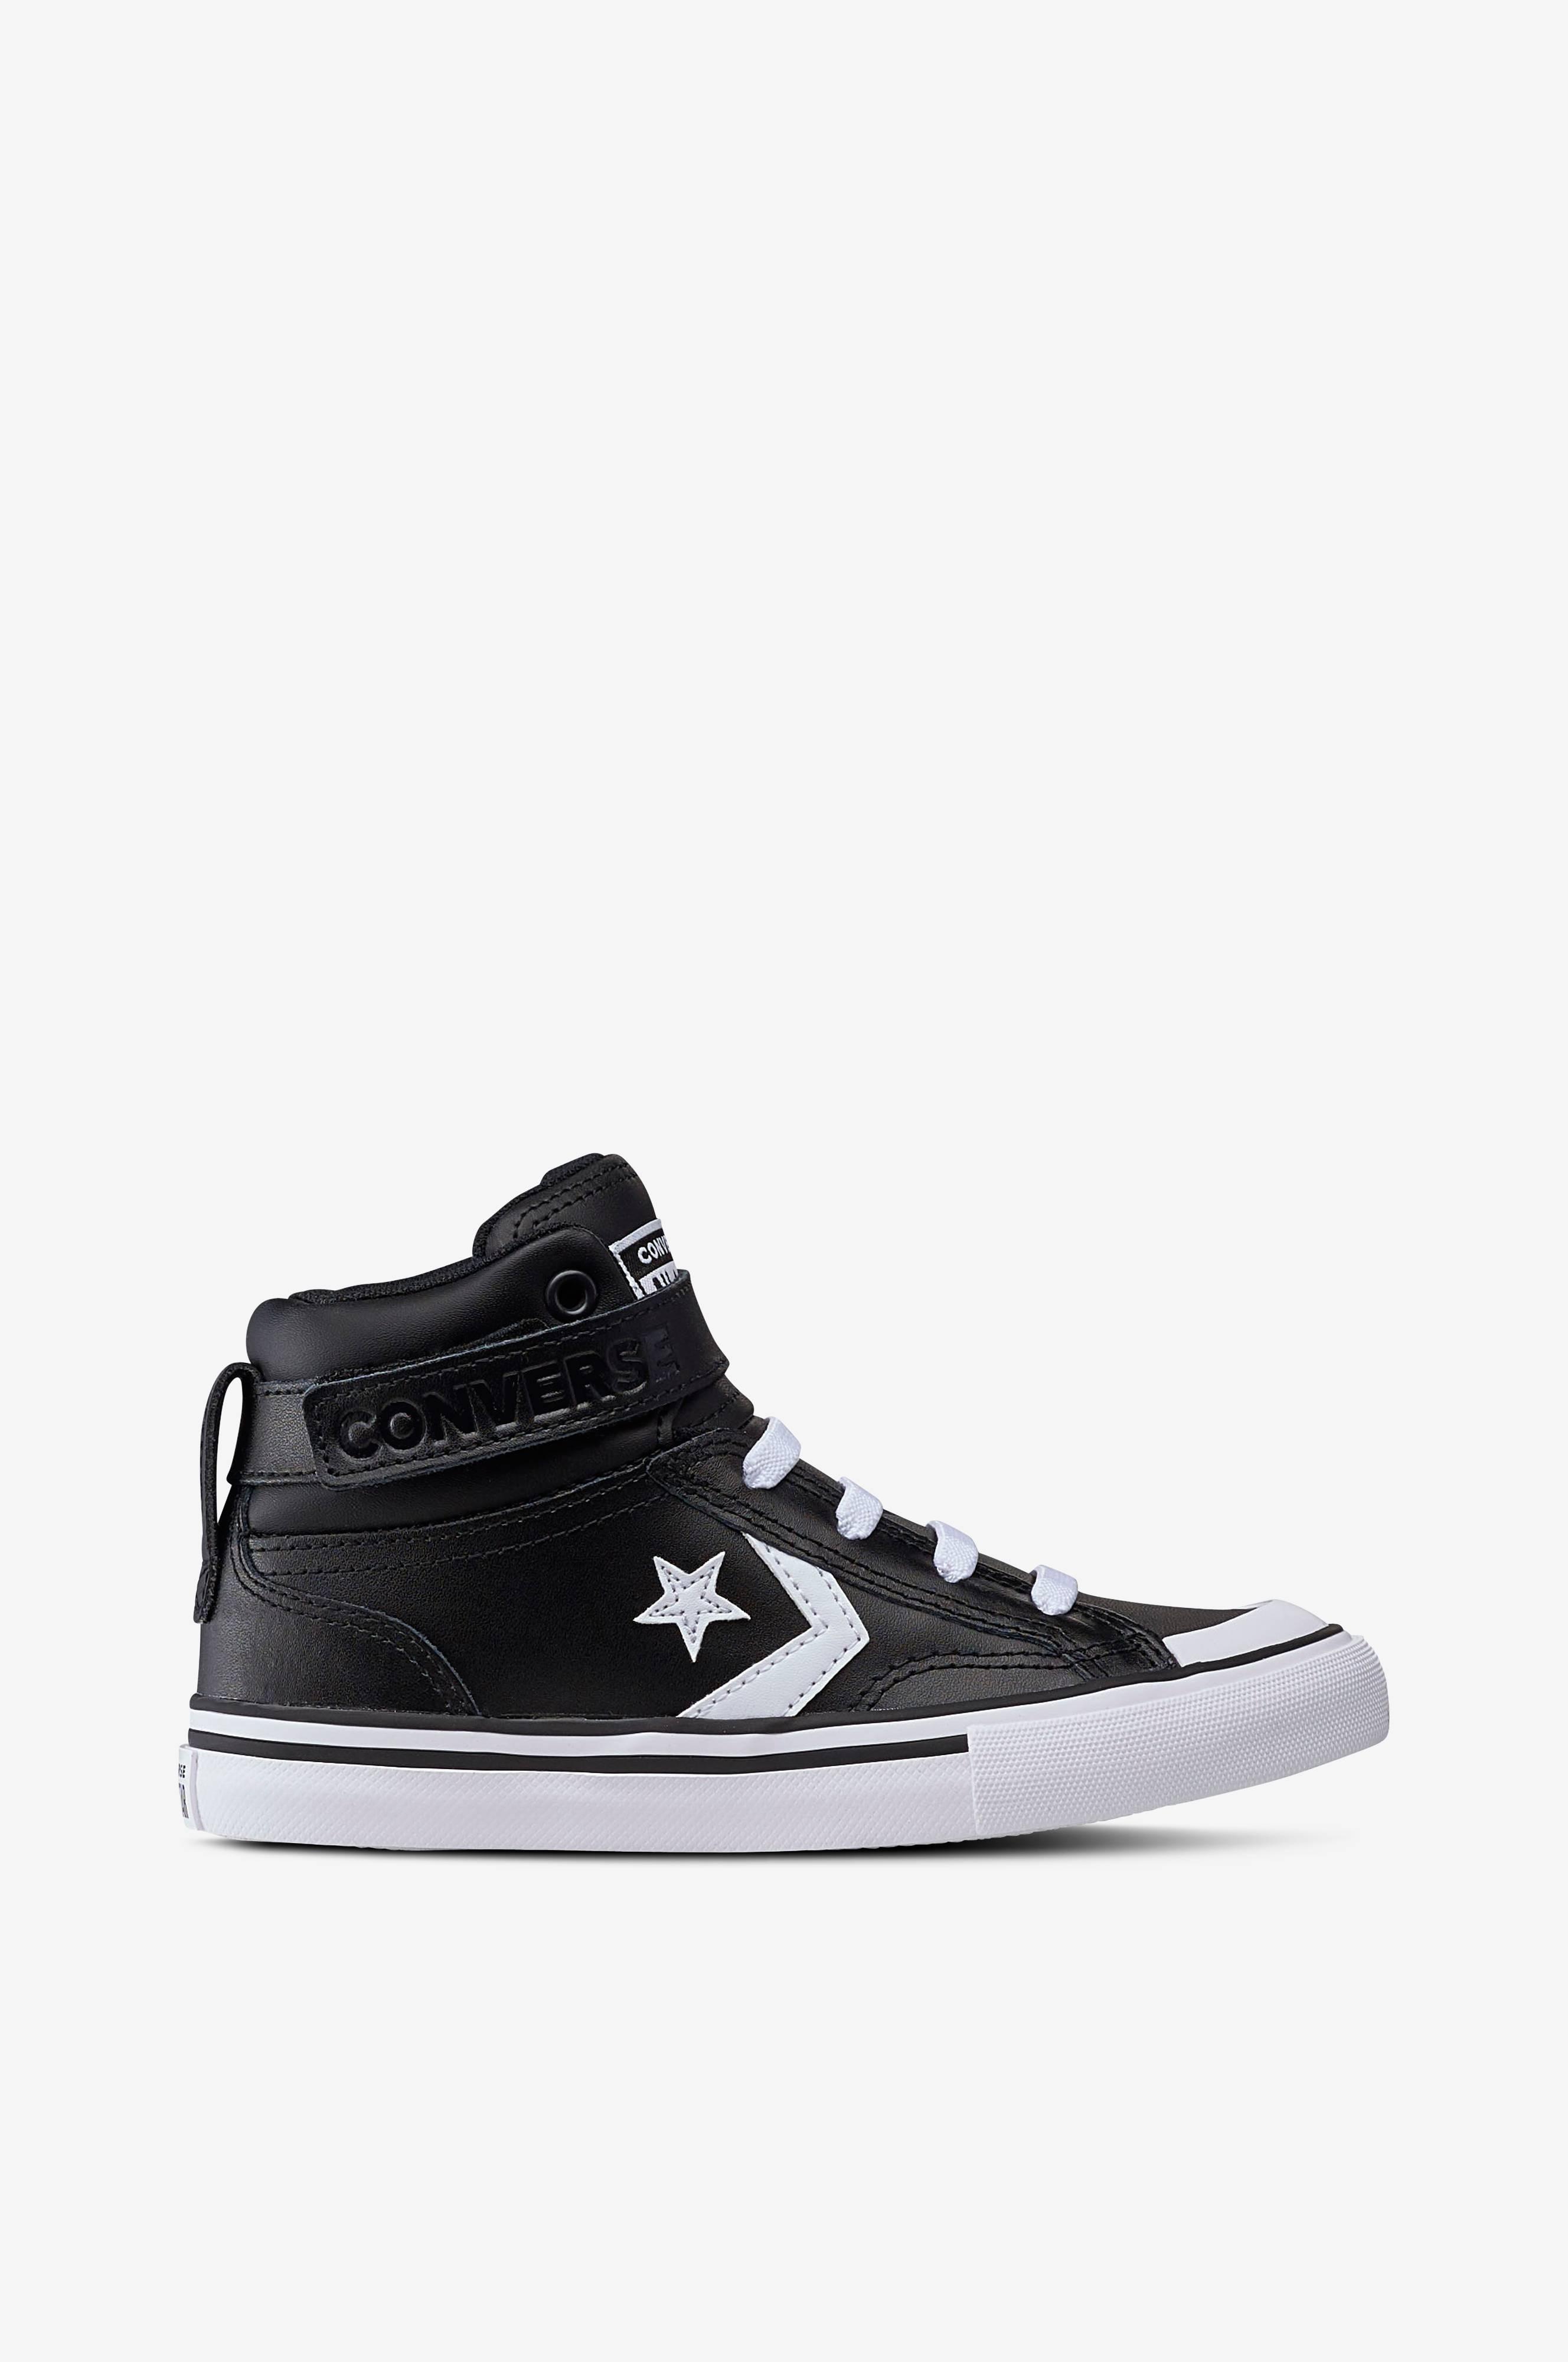 Converse Sneakers Pro Blaze Strap Hi Sort Børn Ellosdk